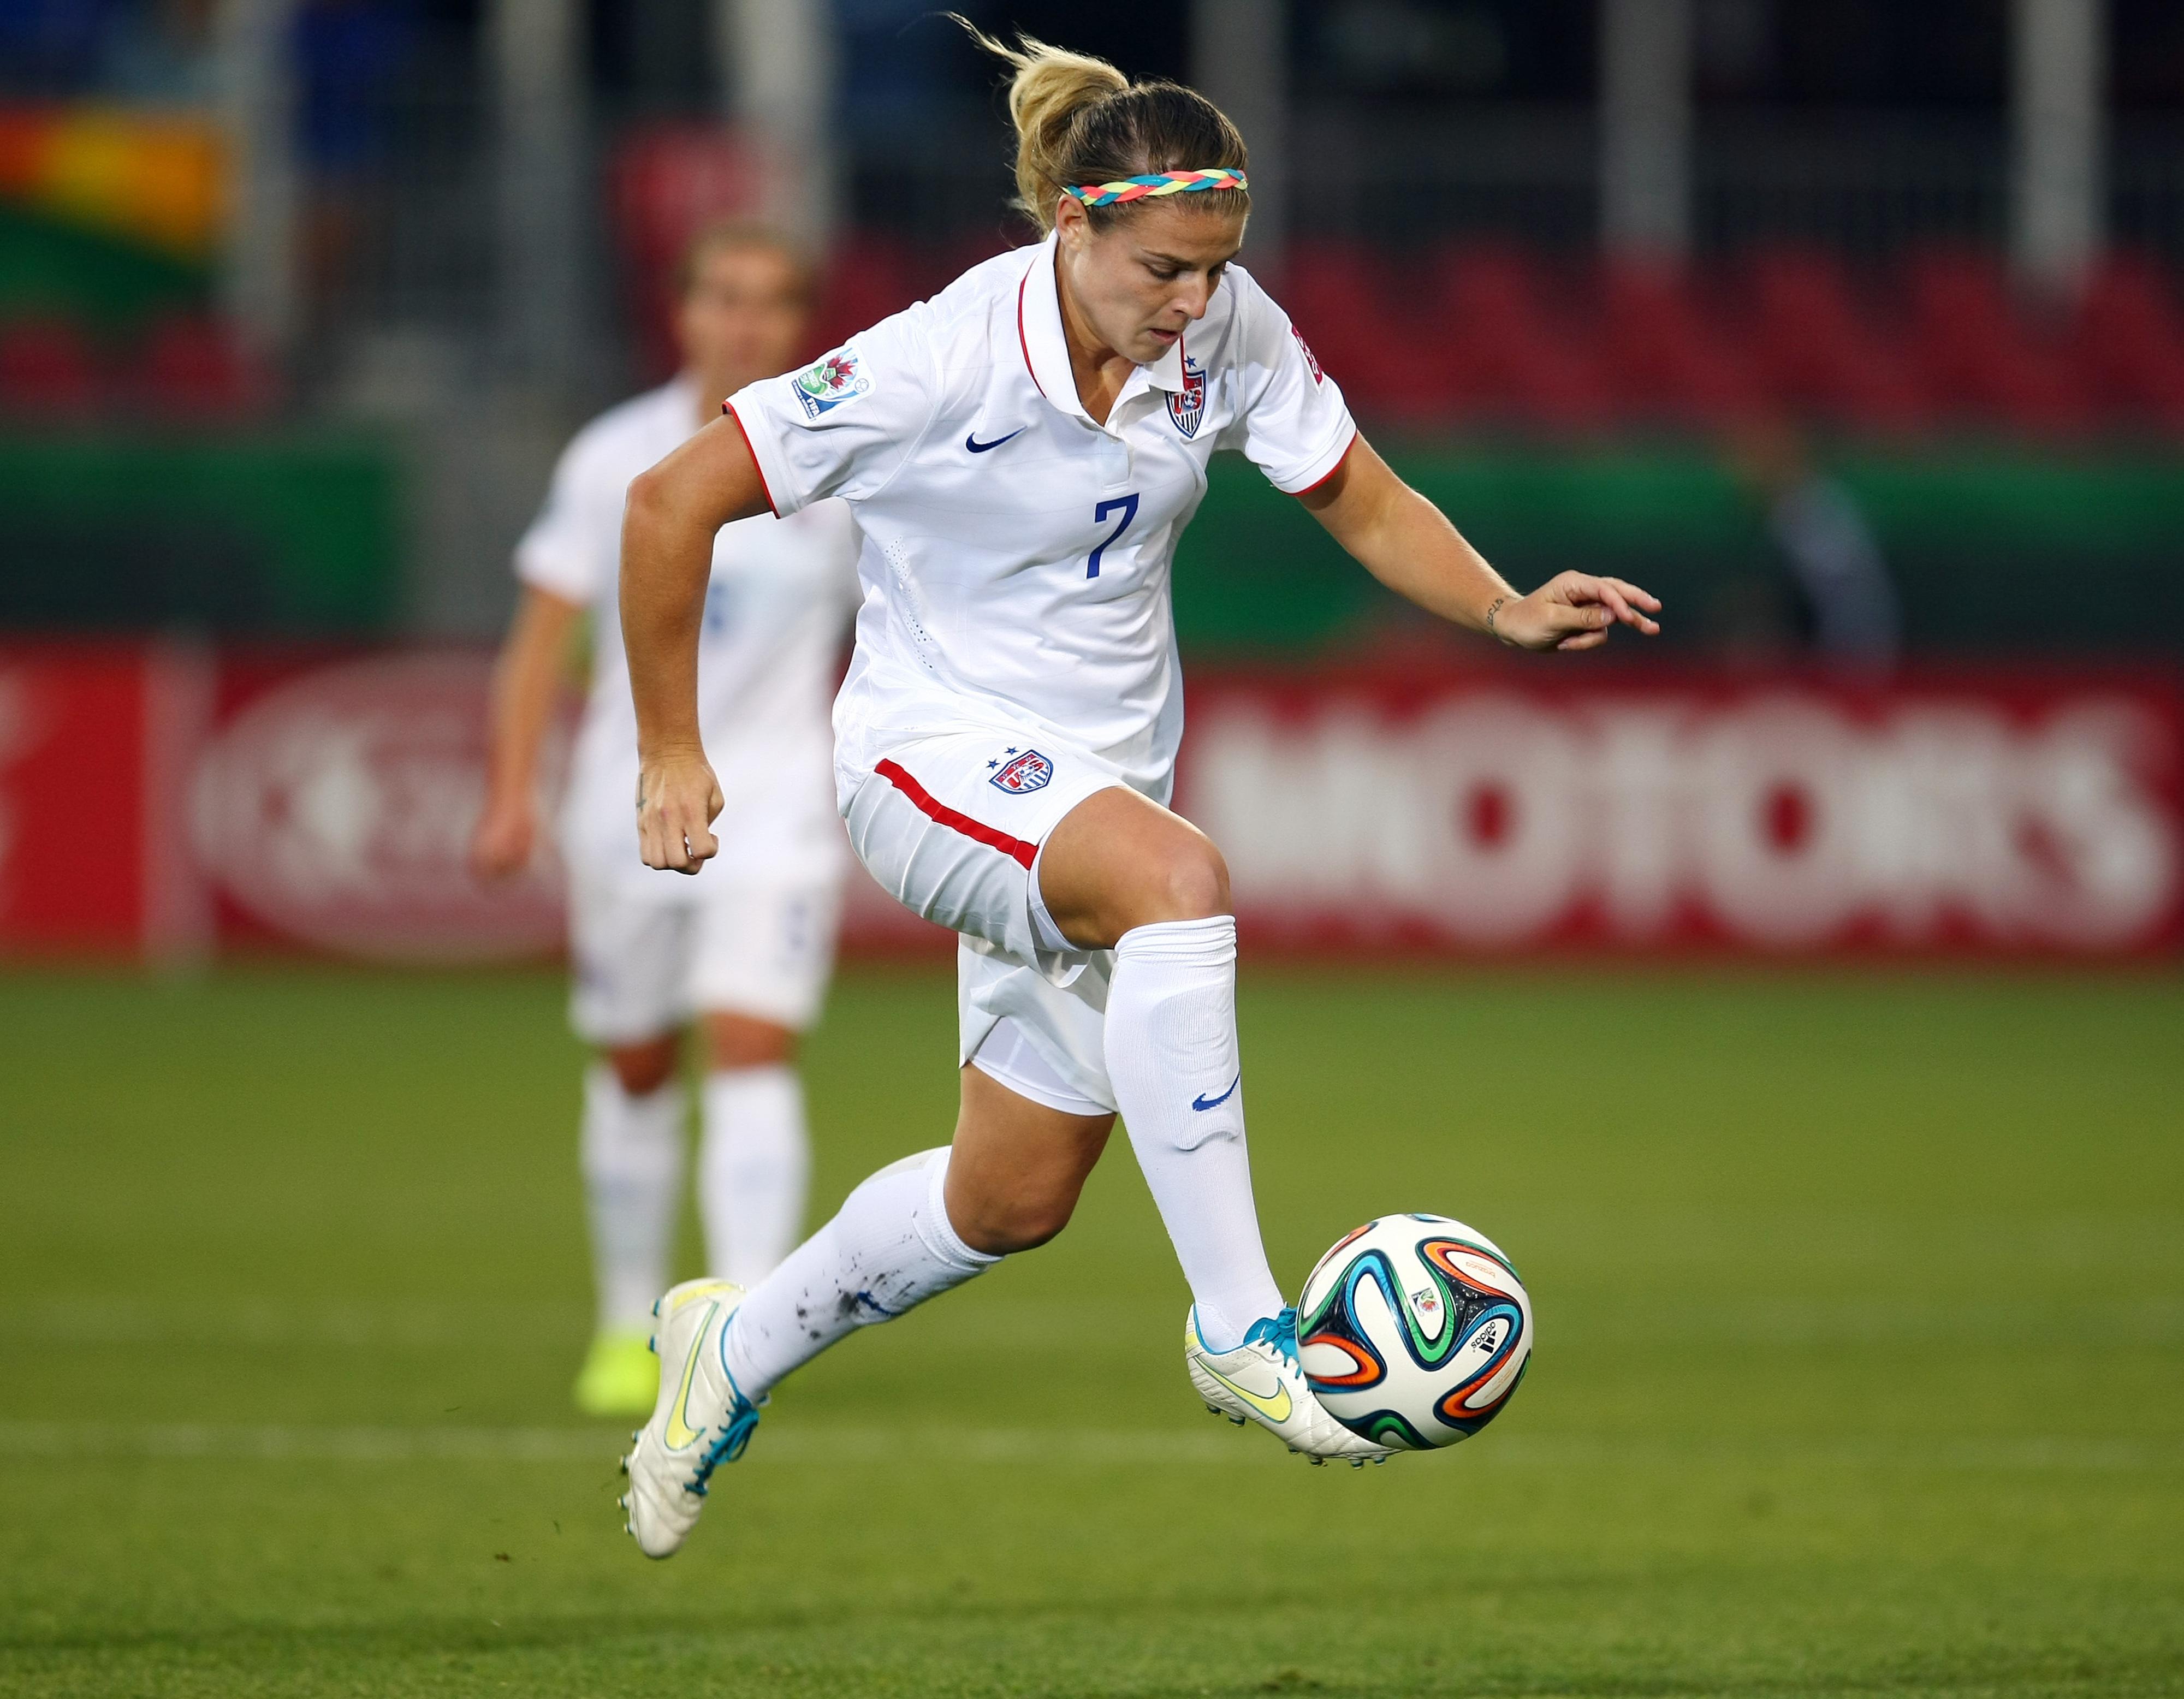 Florida's Savannah Jordan pictured playing for the United States U-23 Team